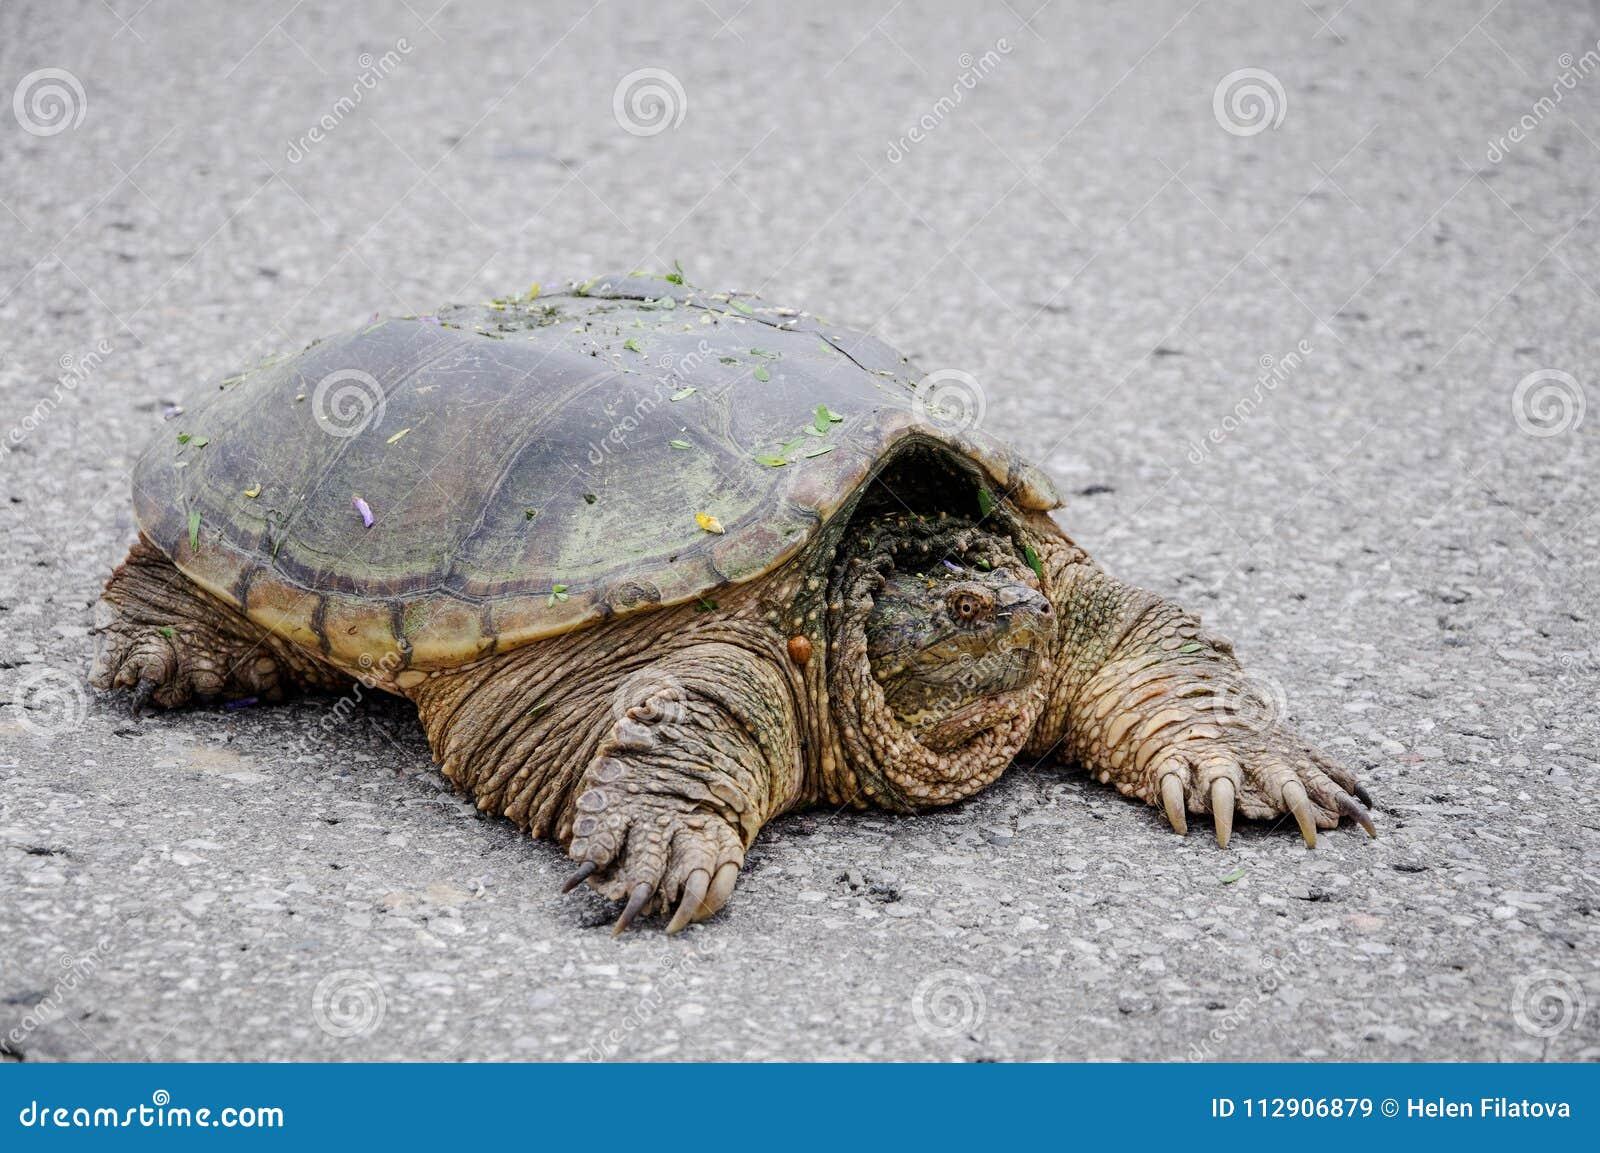 94e702be8f89 Μεγάλη χελώνα σε έναν δρόμο Στοκ Εικόνα - εικόνα από δέρμα